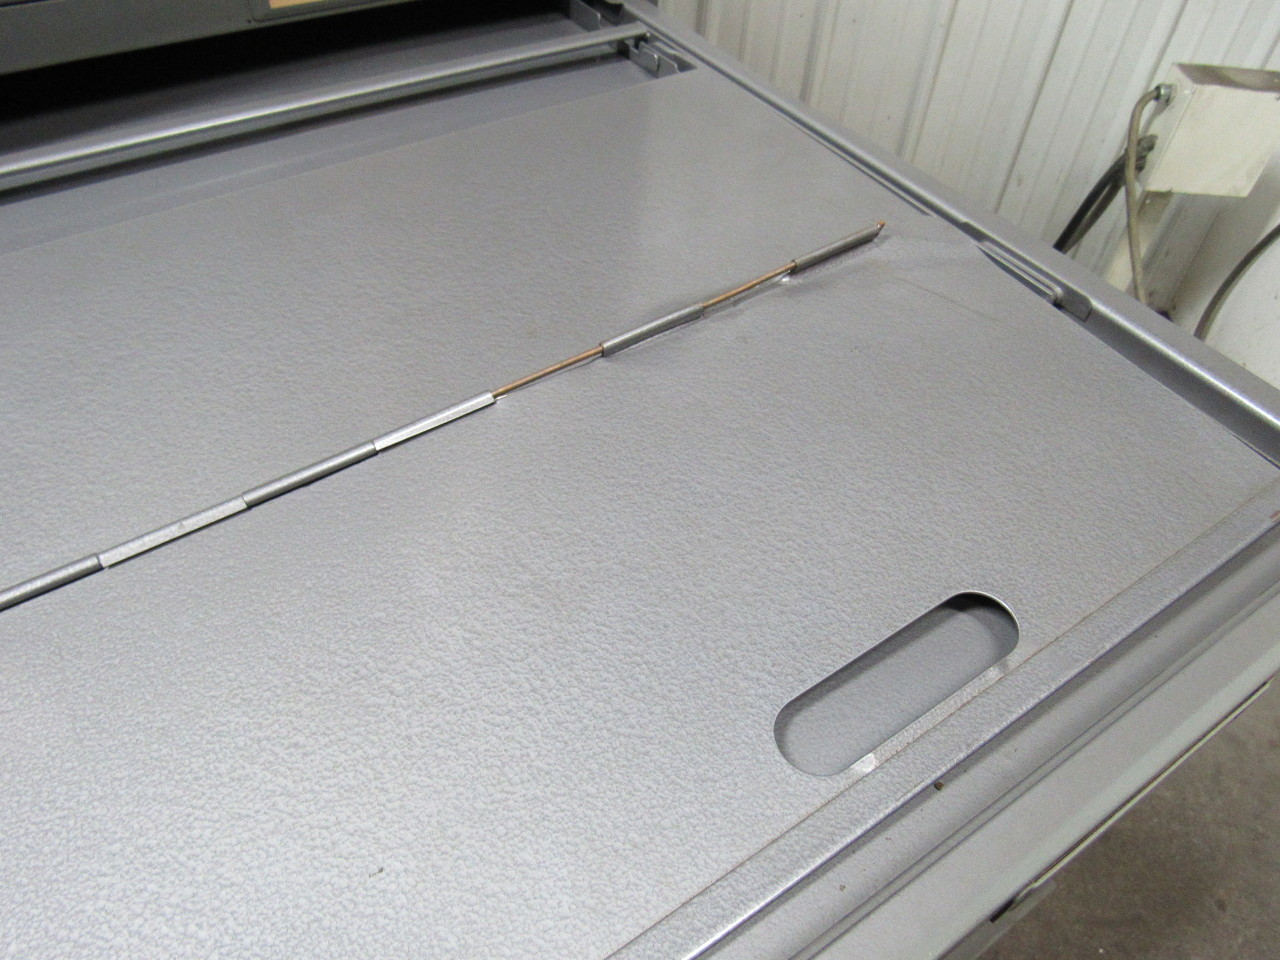 major file cabinet bar 4 drawer shaw walker file cabinet locking mechanism by metal filing cabinet metal filing cabinet runners metal filing